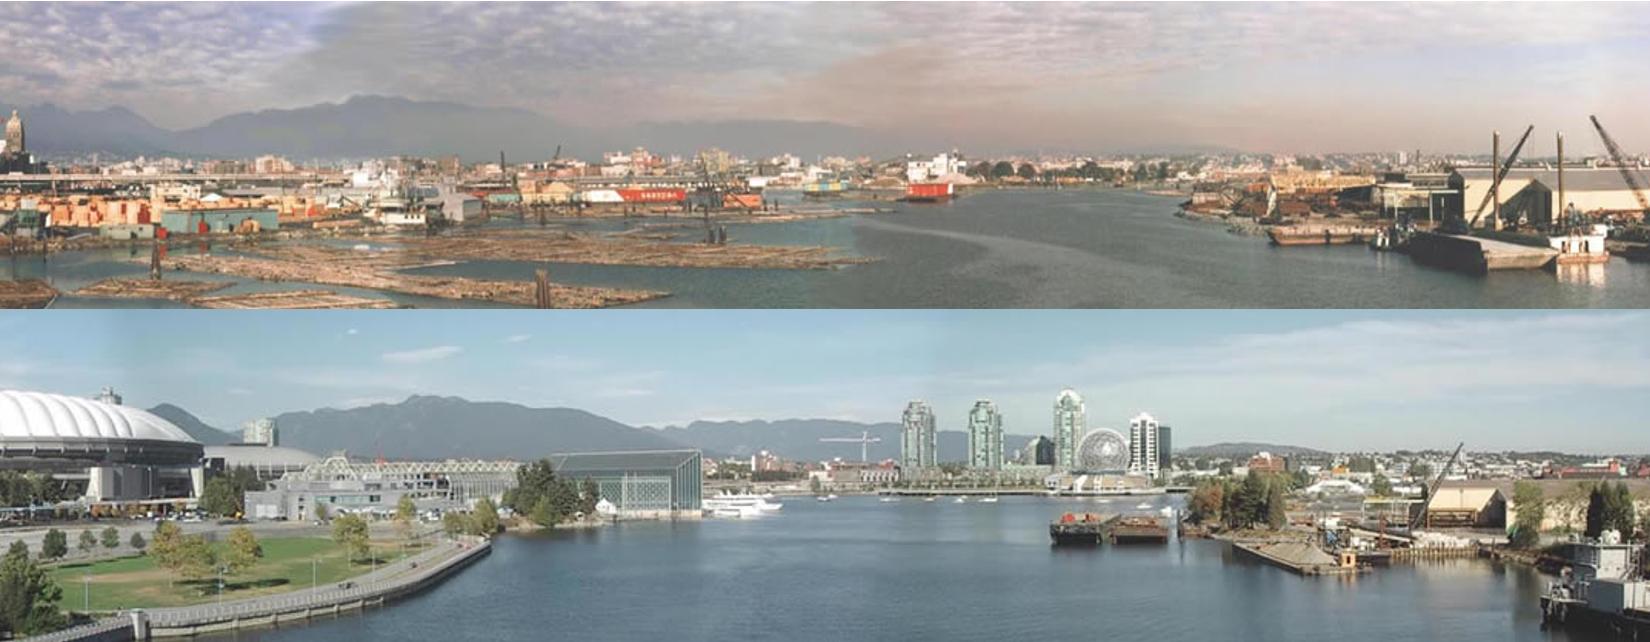 Image-False-Creek-Vancouver-1978-2003